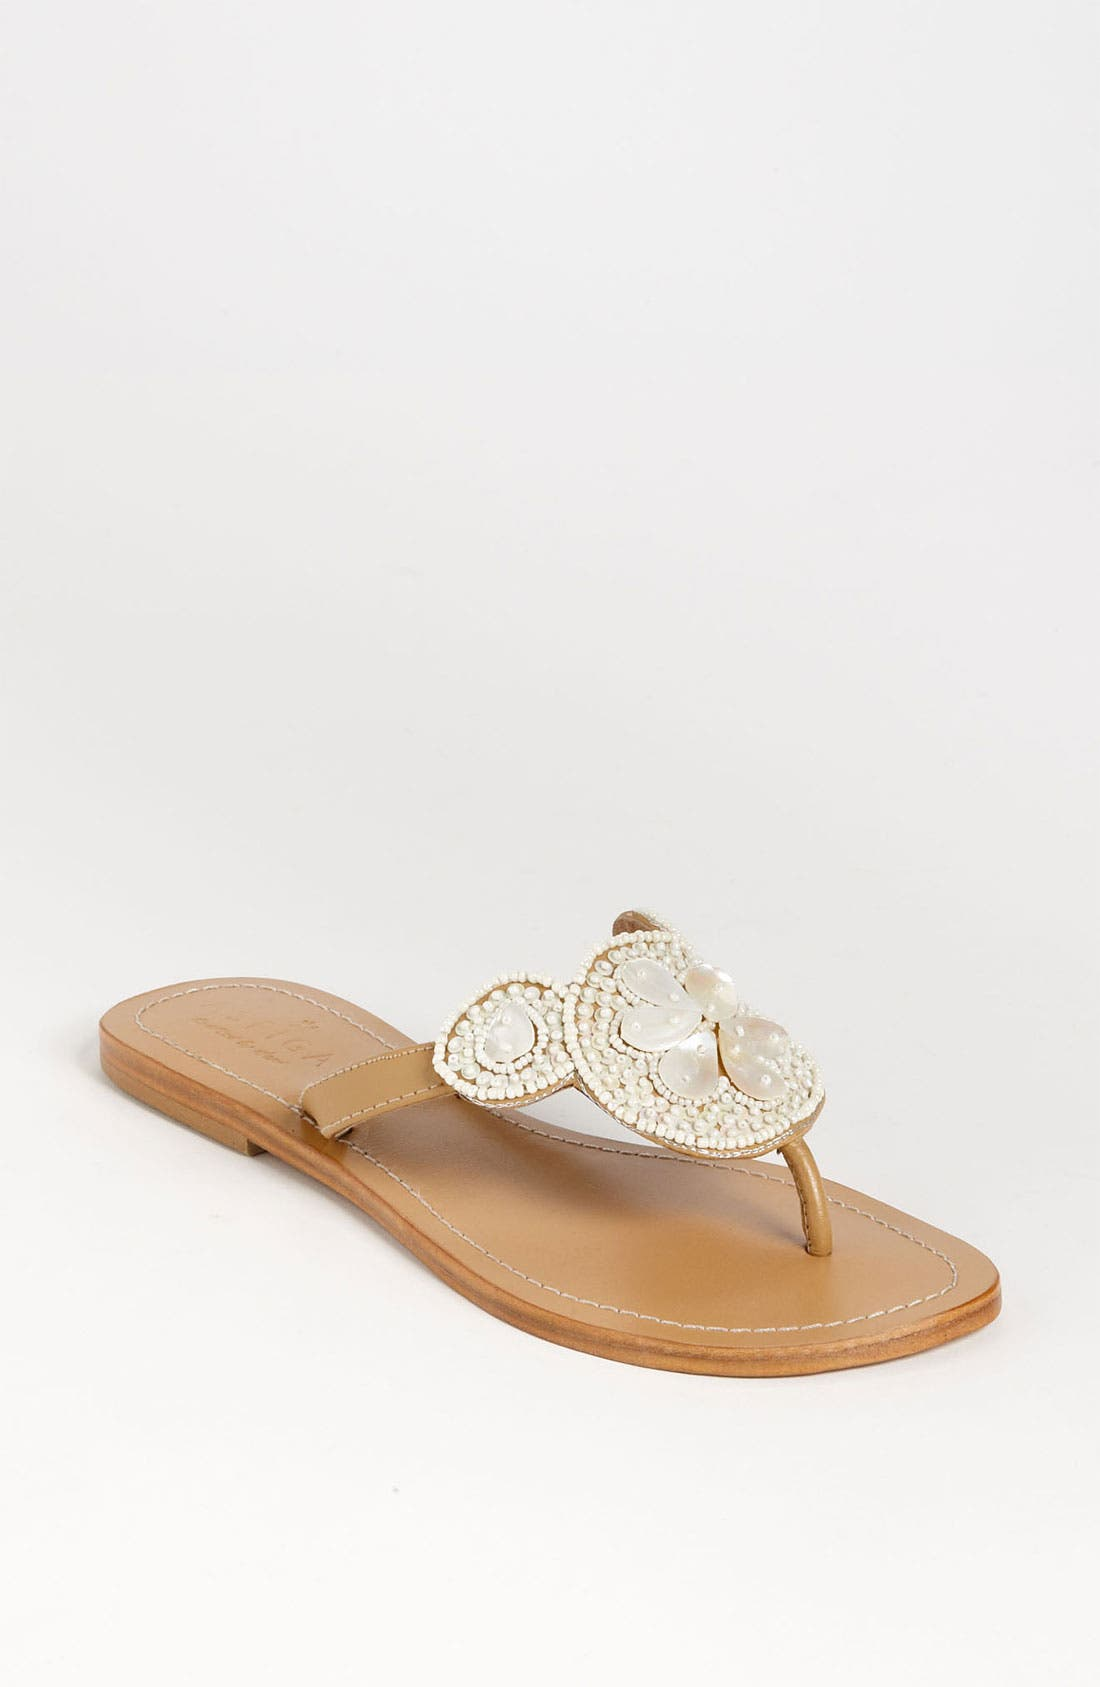 Alternate Image 1 Selected - Aspiga 'Anala' Sandal